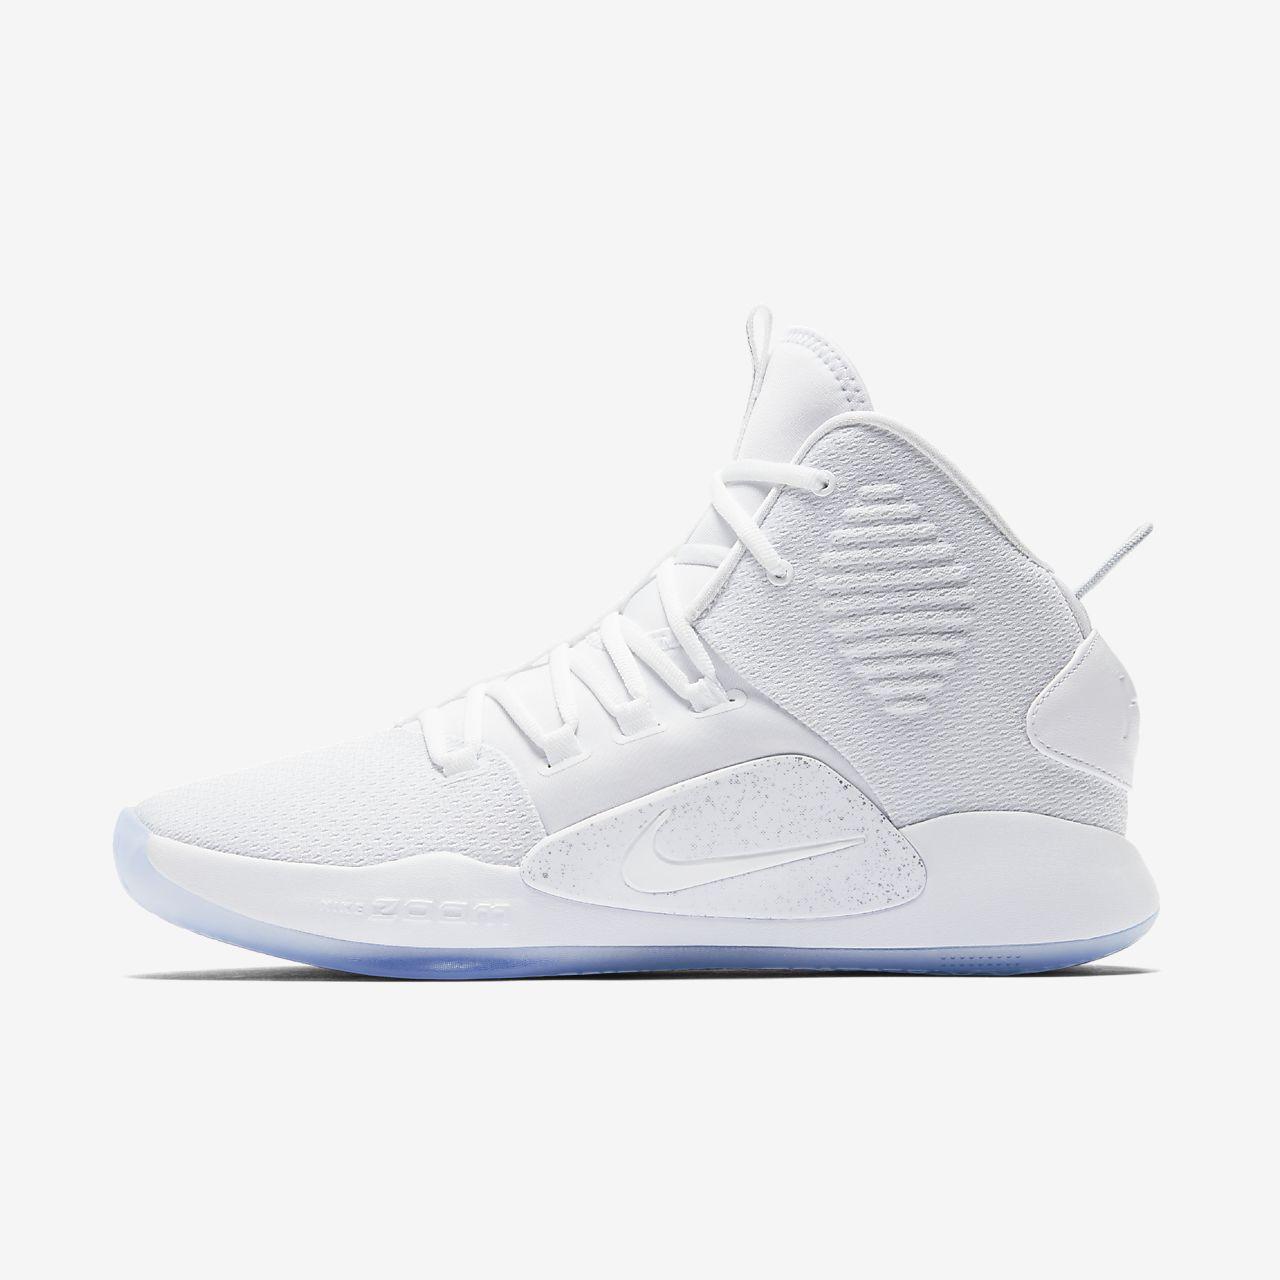 f5aaf599c1b80 Nike Hyperdunk X Zapatillas de baloncesto. Nike.com ES